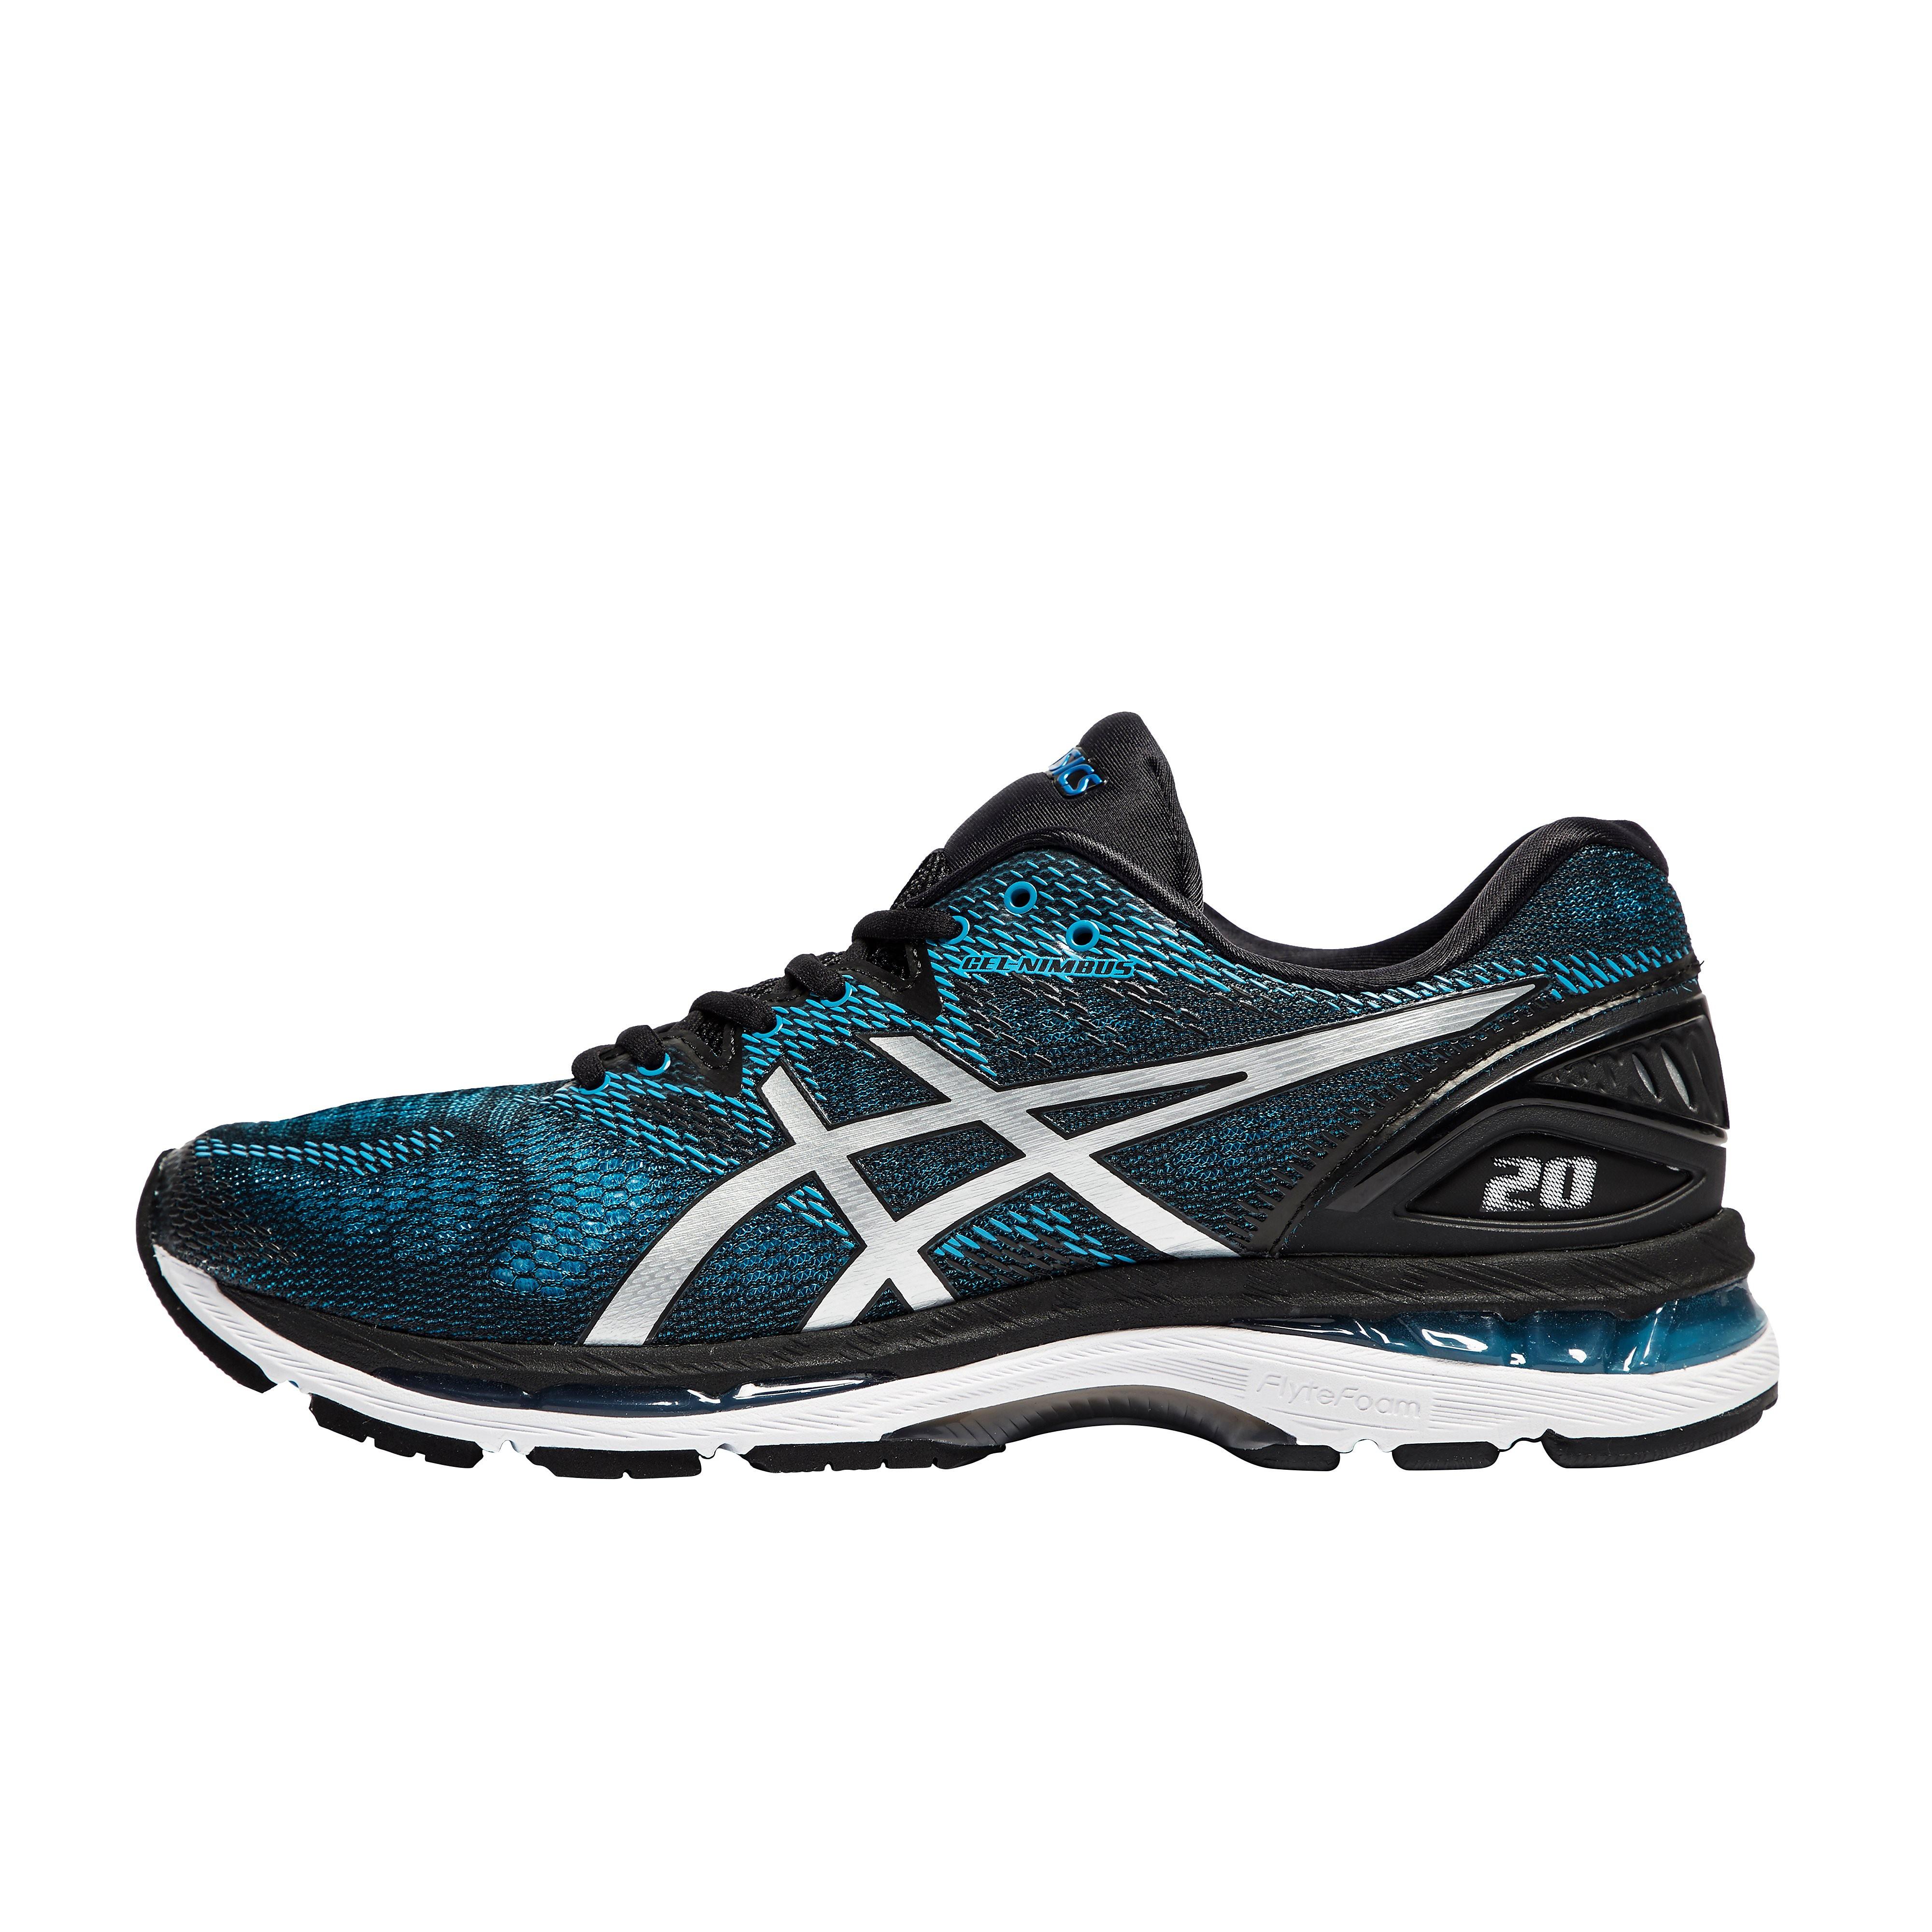 Men's ASICS Gel-Nimbus 20 Running Shoes - Blue/Black, Blue